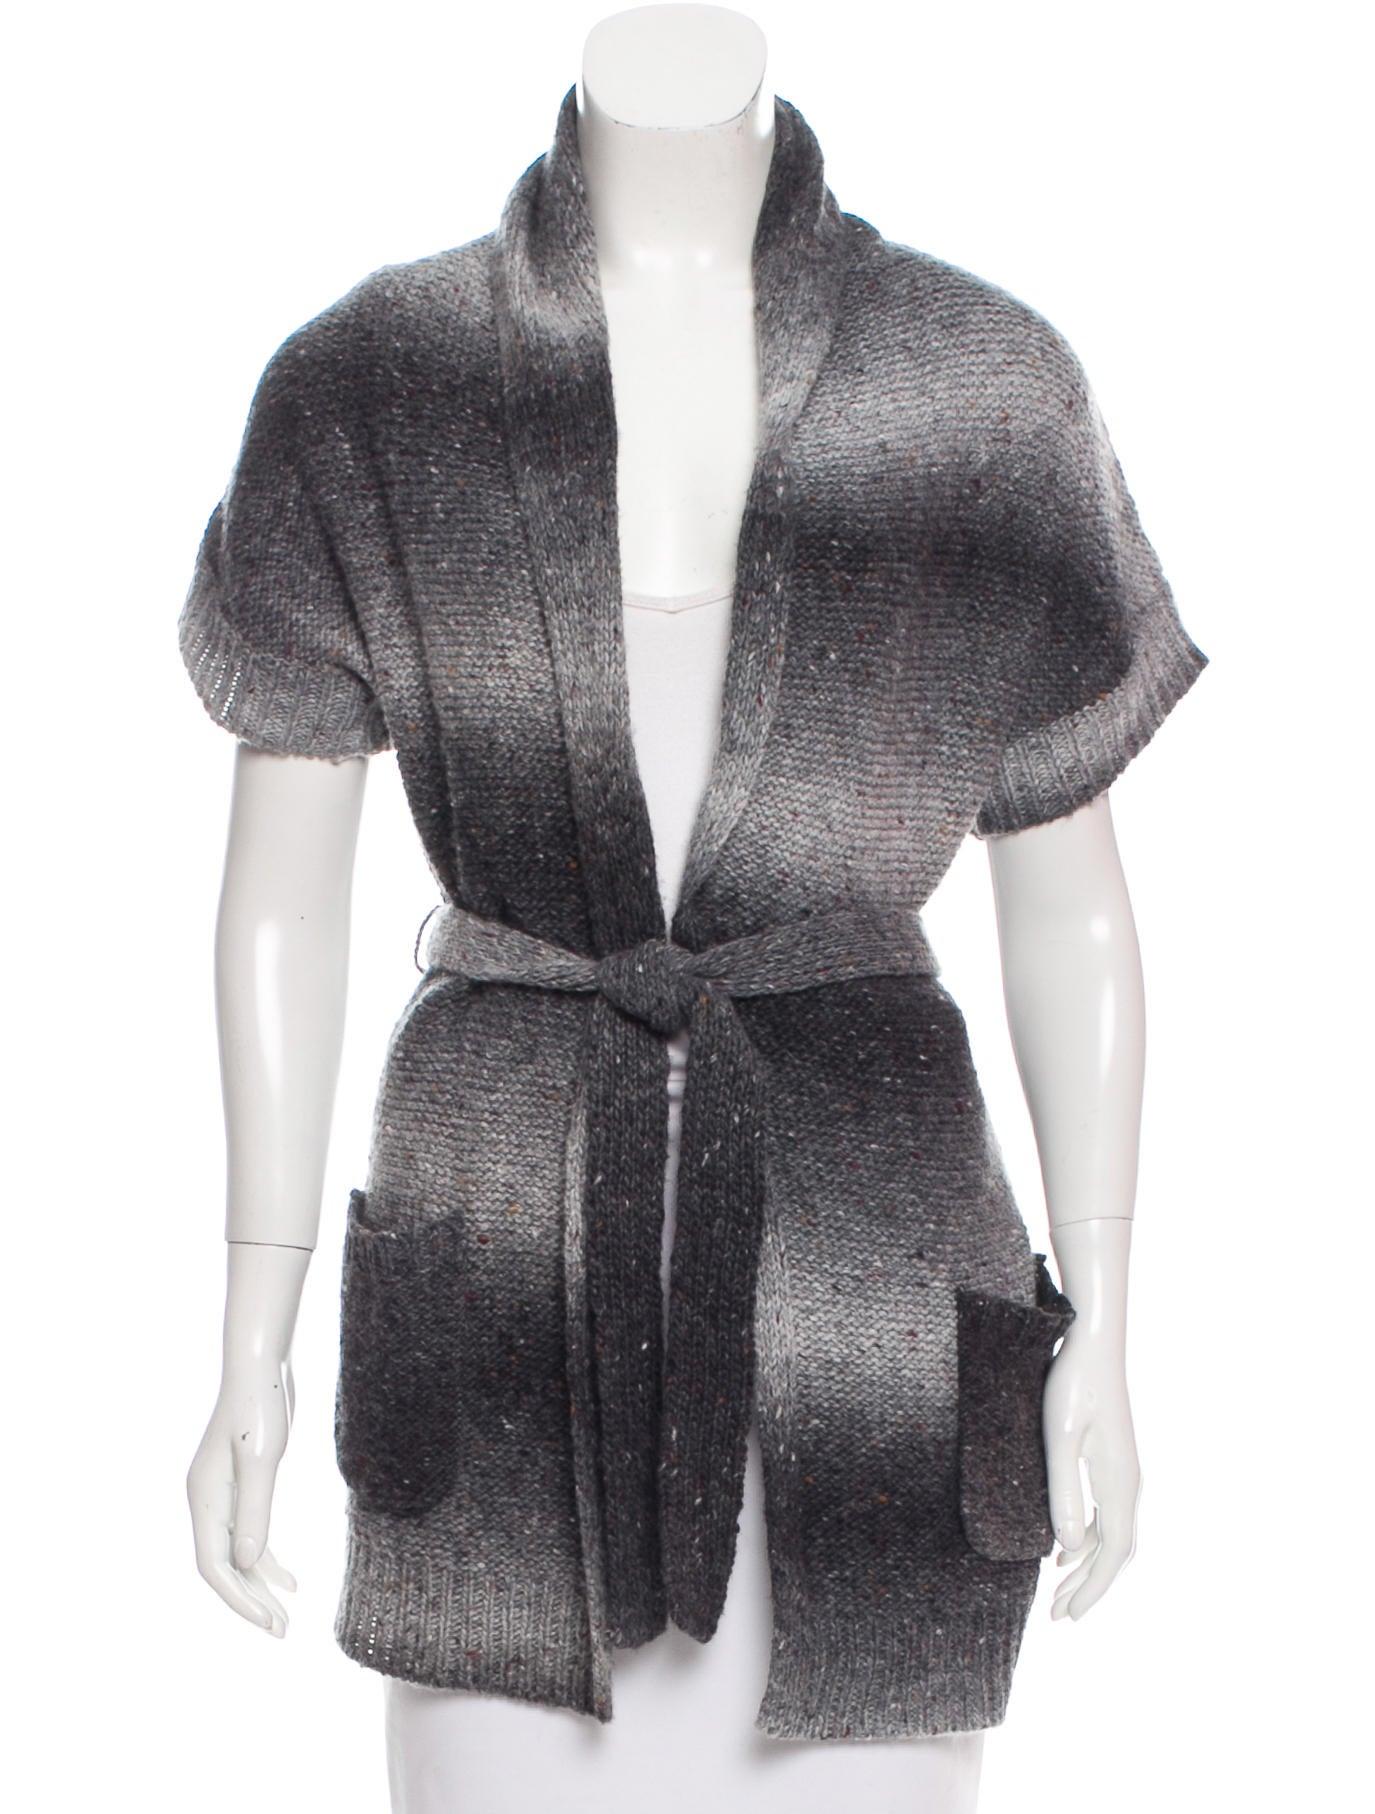 Tibi Short Sleeve Wrap Sweater - Clothing - WTI36300 | The RealReal